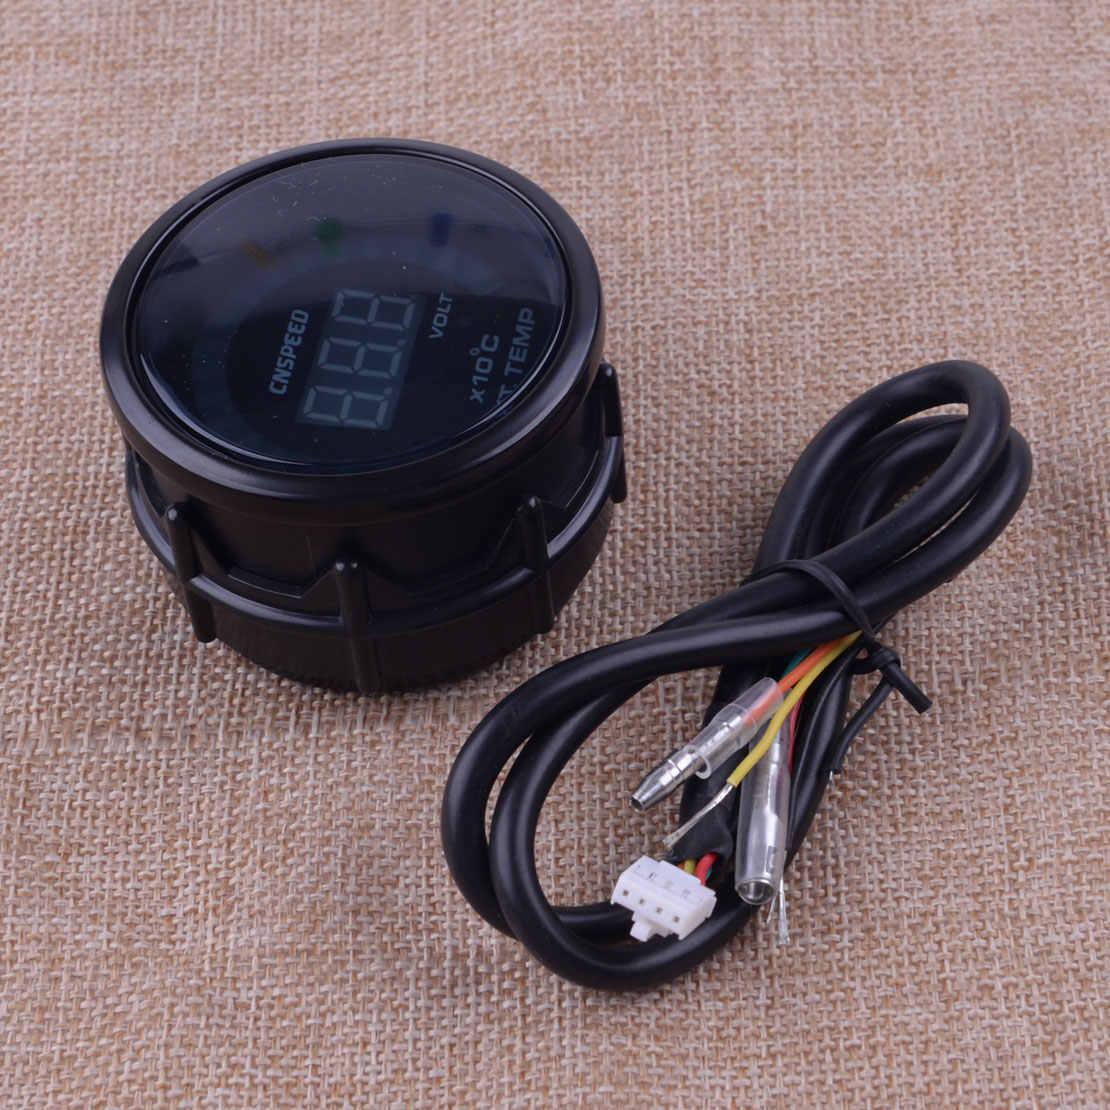 "DWCX العالمي 2 ""52 مللي متر تيار مستمر 12 فولت LED الرقمية العادم الغاز درجة الحرارة EGT درجة الحرارة مقياس متر الاستشعار رصد اكسسوارات السيارات الداخلية"